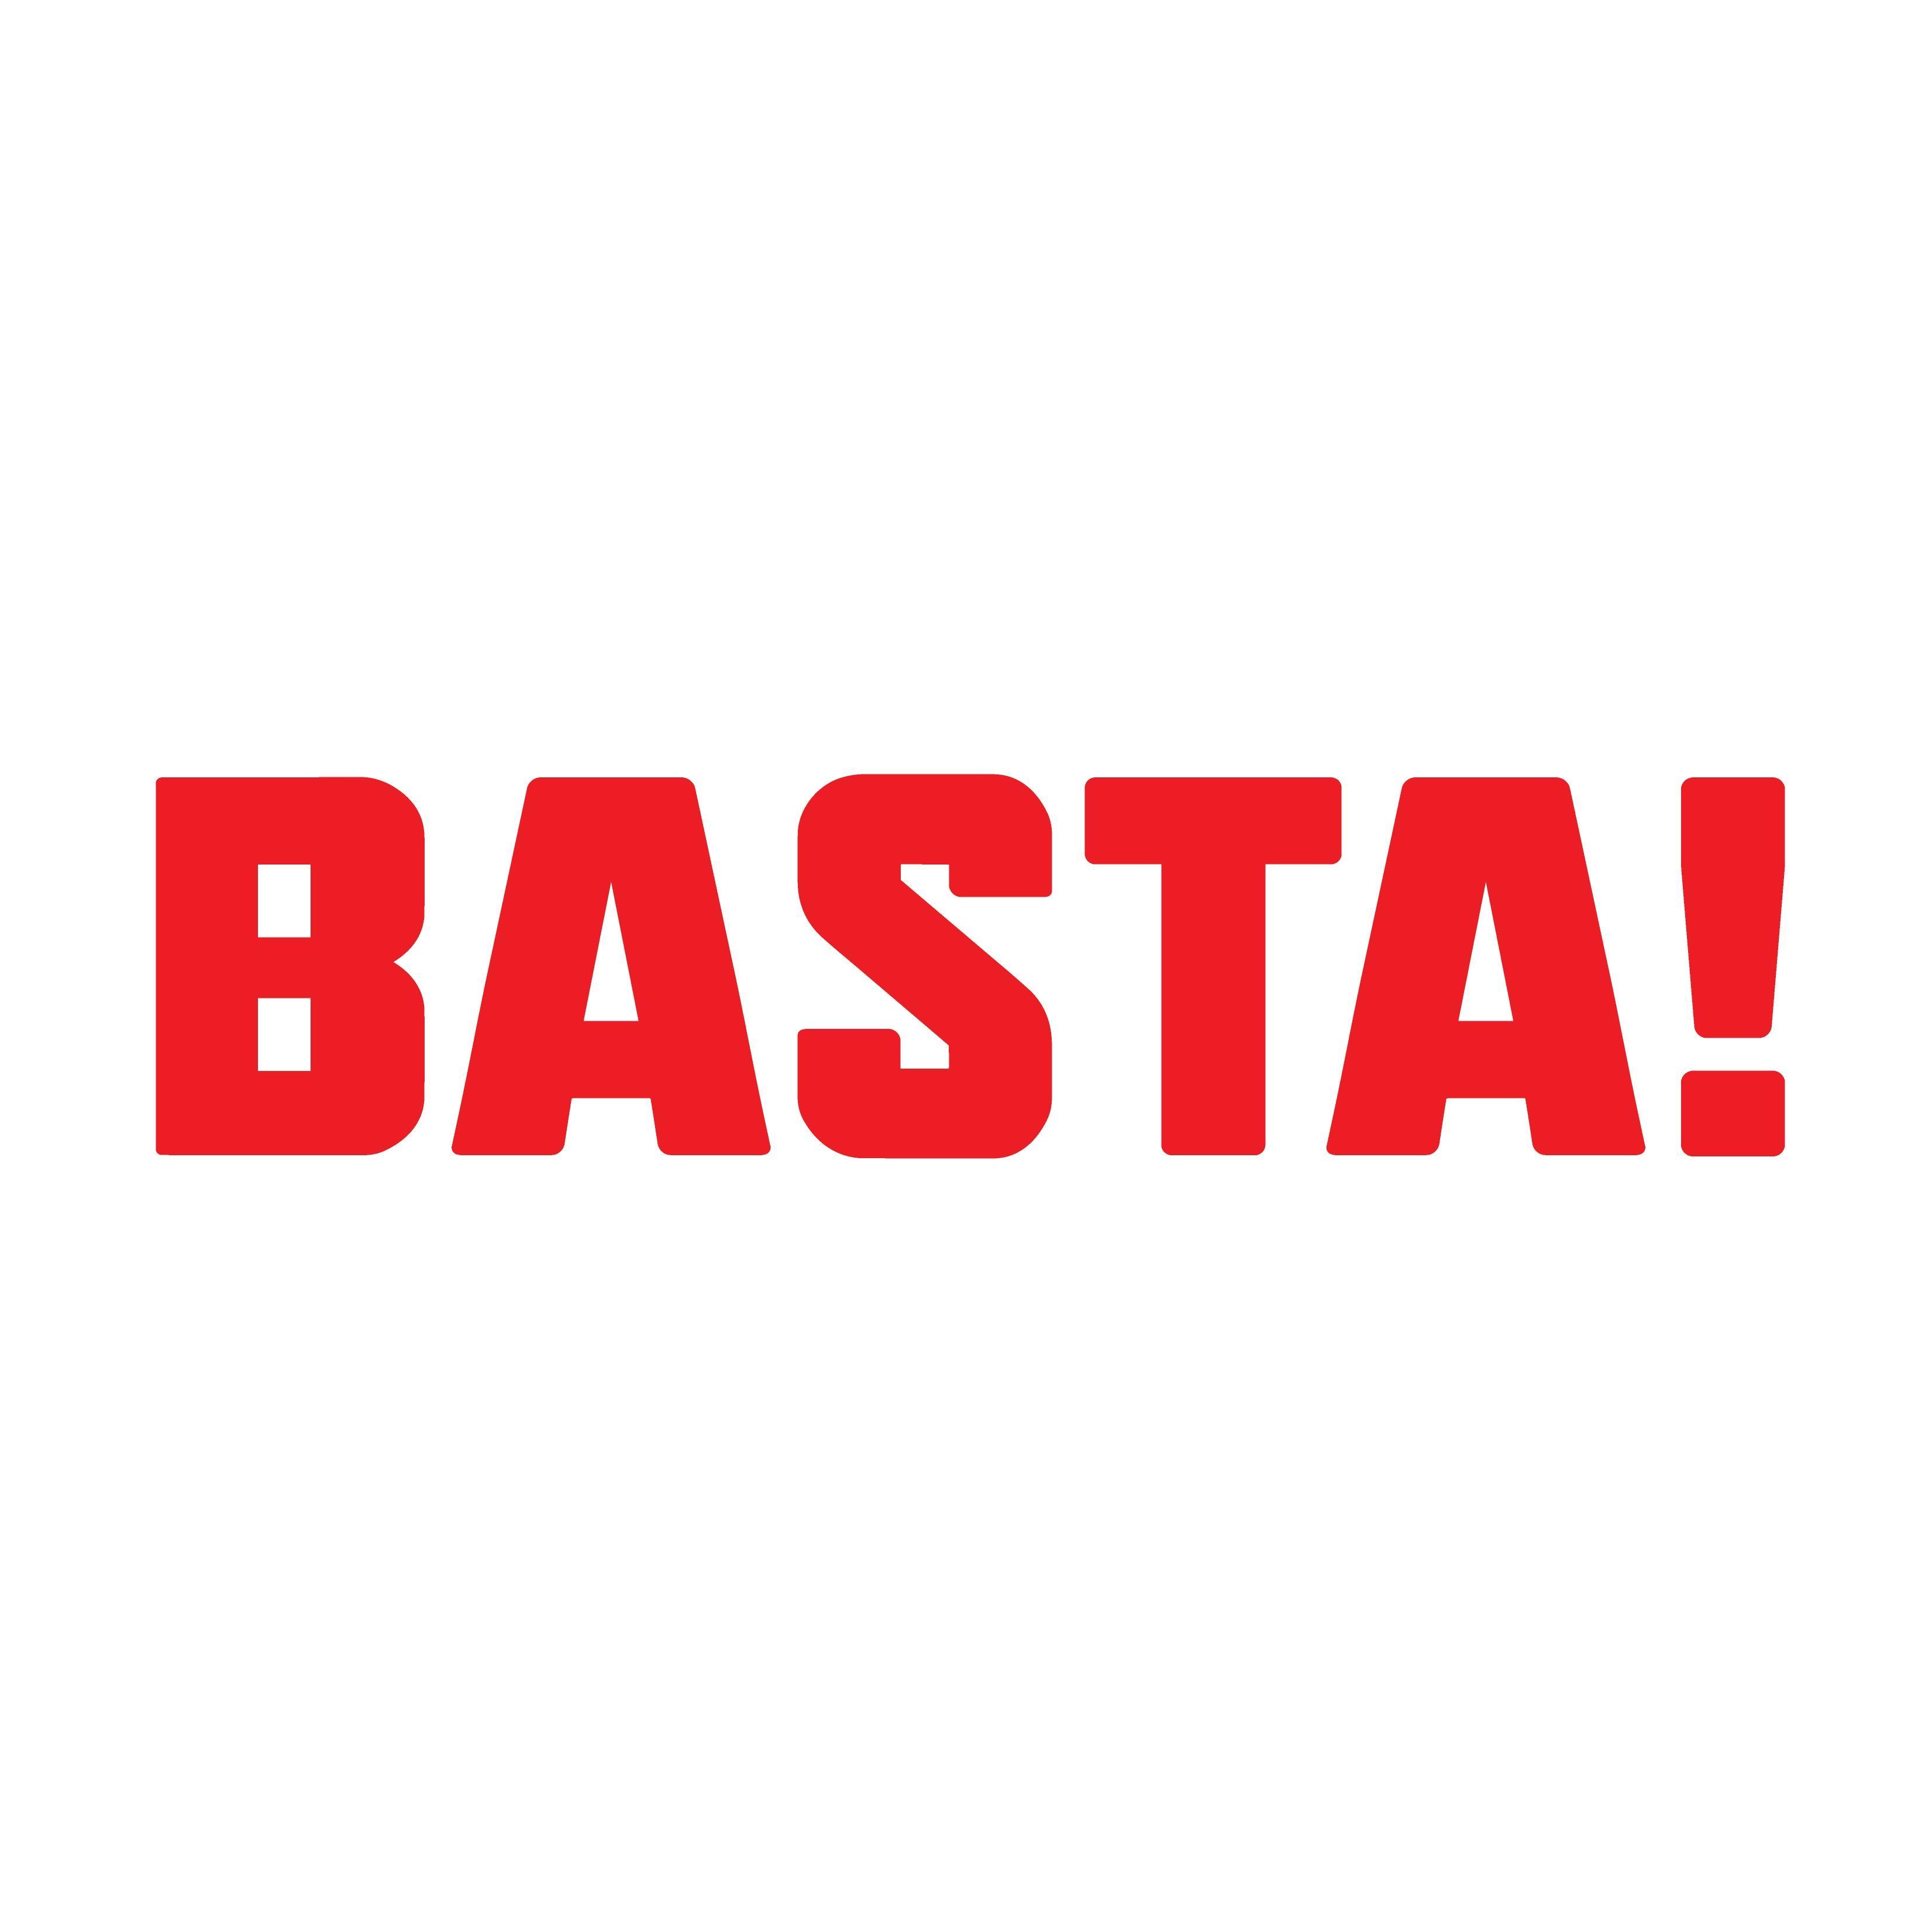 BASTA!